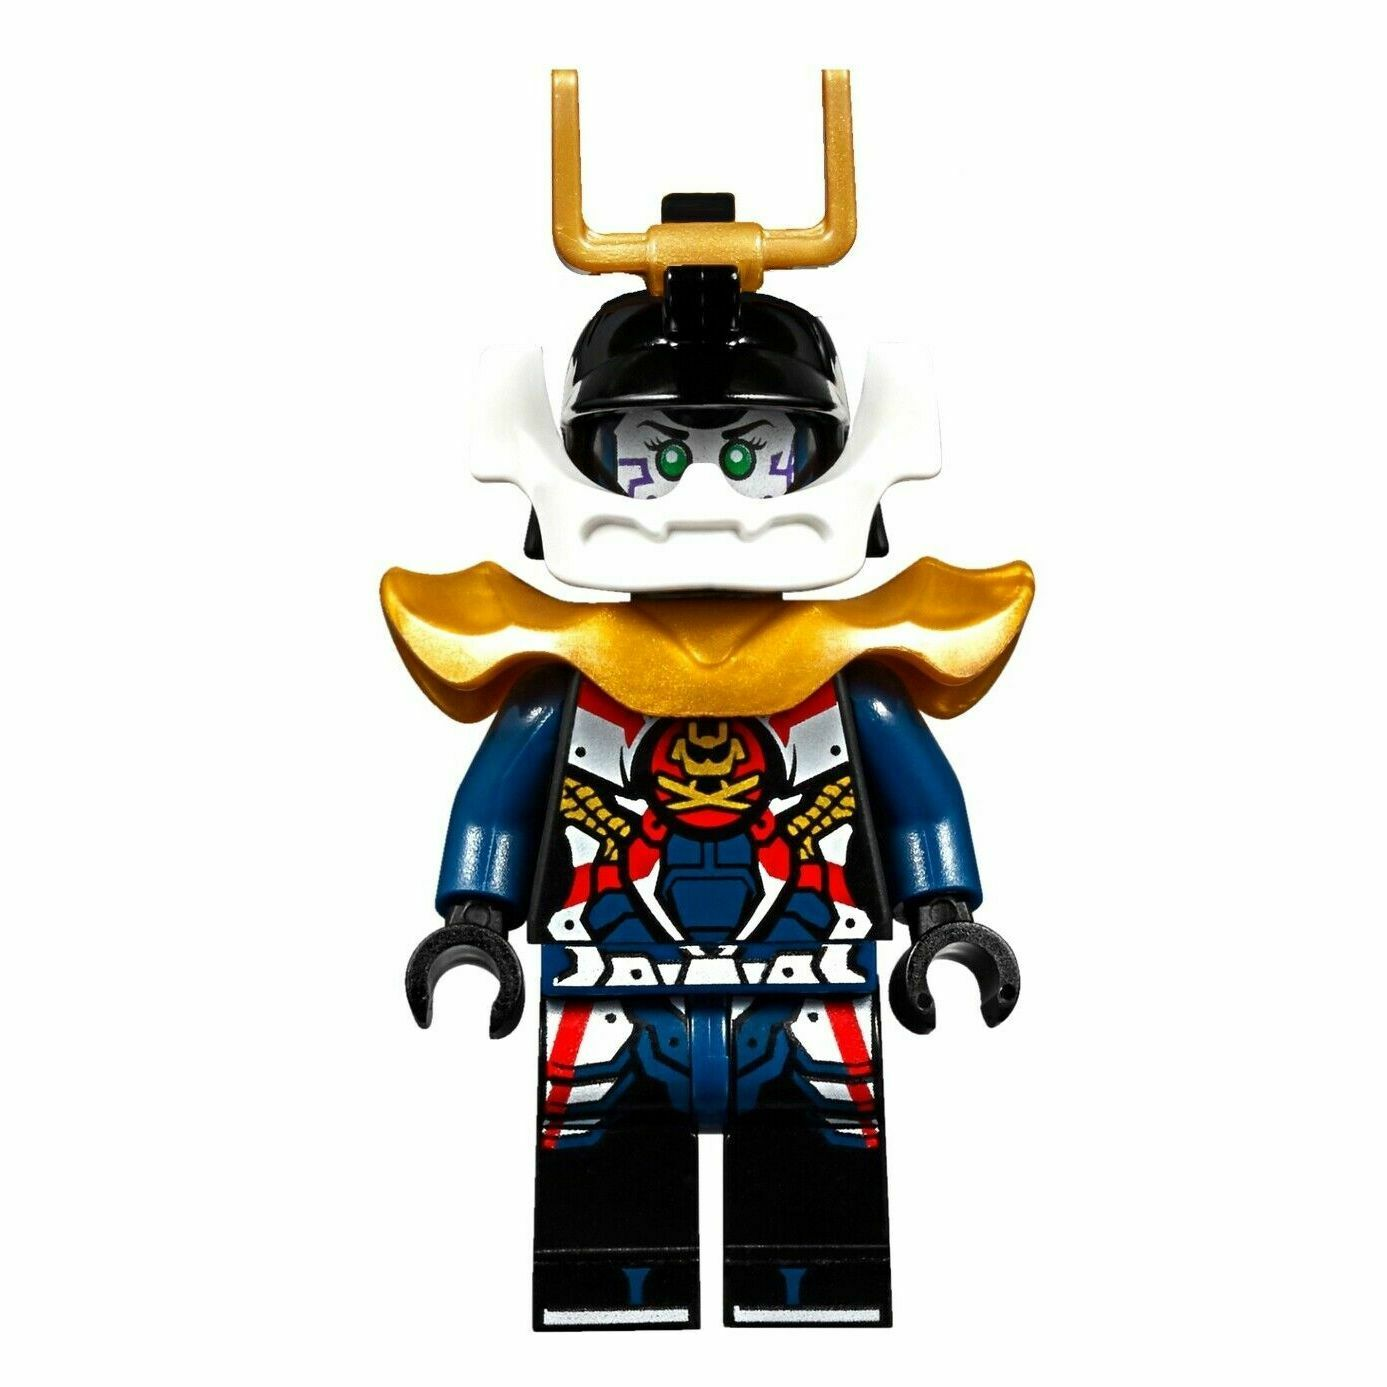 Details About Lego Ninjago Samurai X Pixel Minifigure New Golden Armour Helmet Genuine